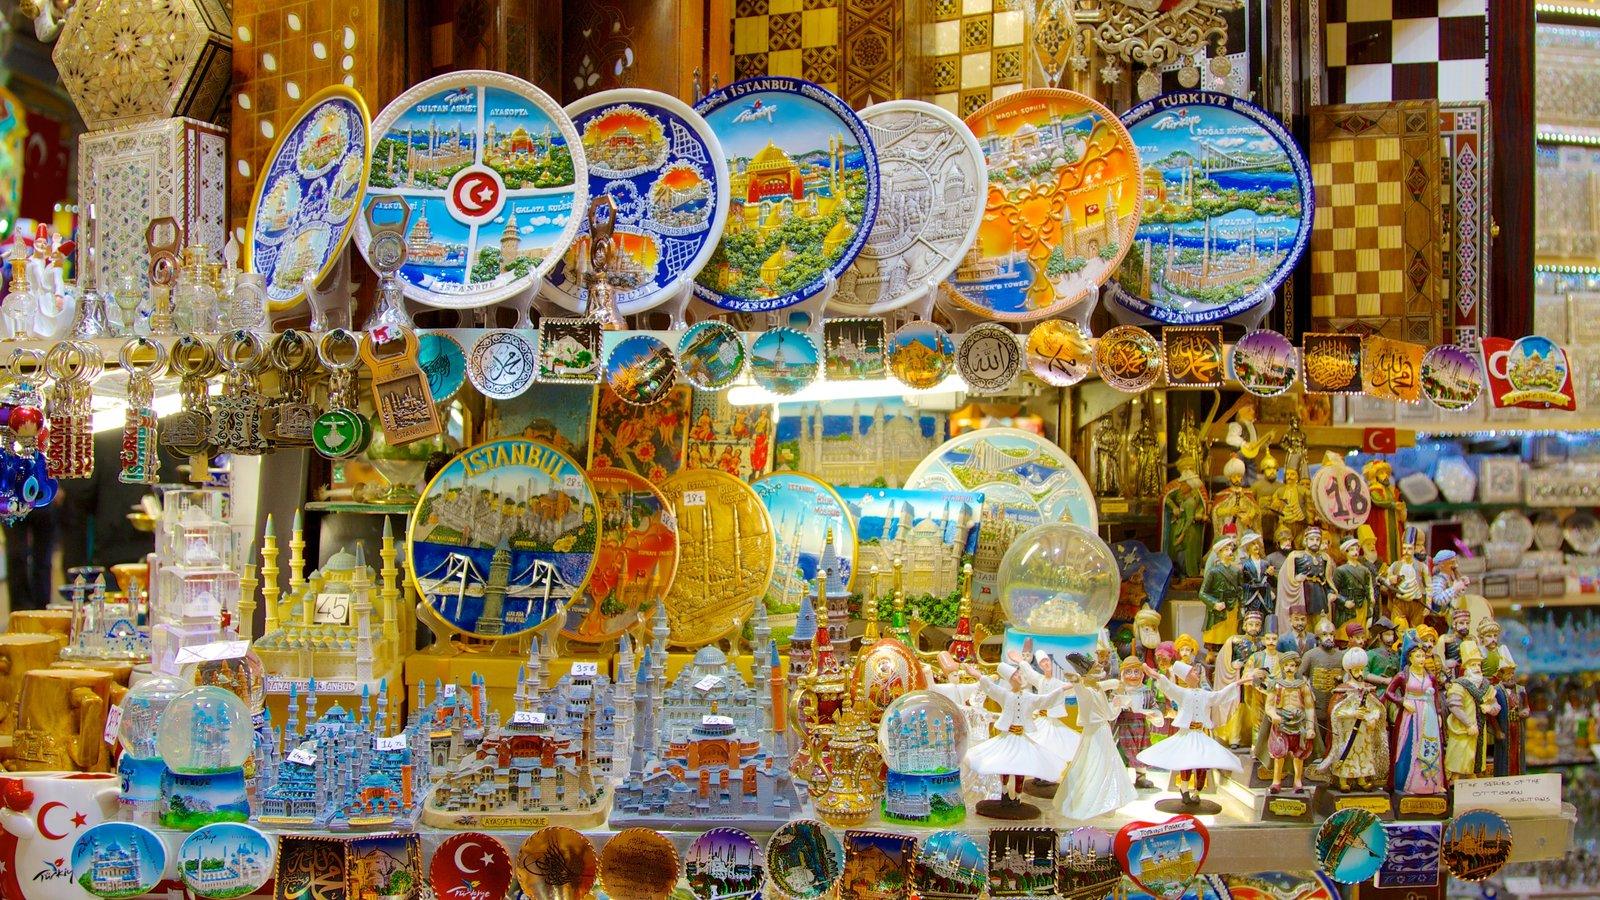 Grand Bazaar featuring markets and interior views